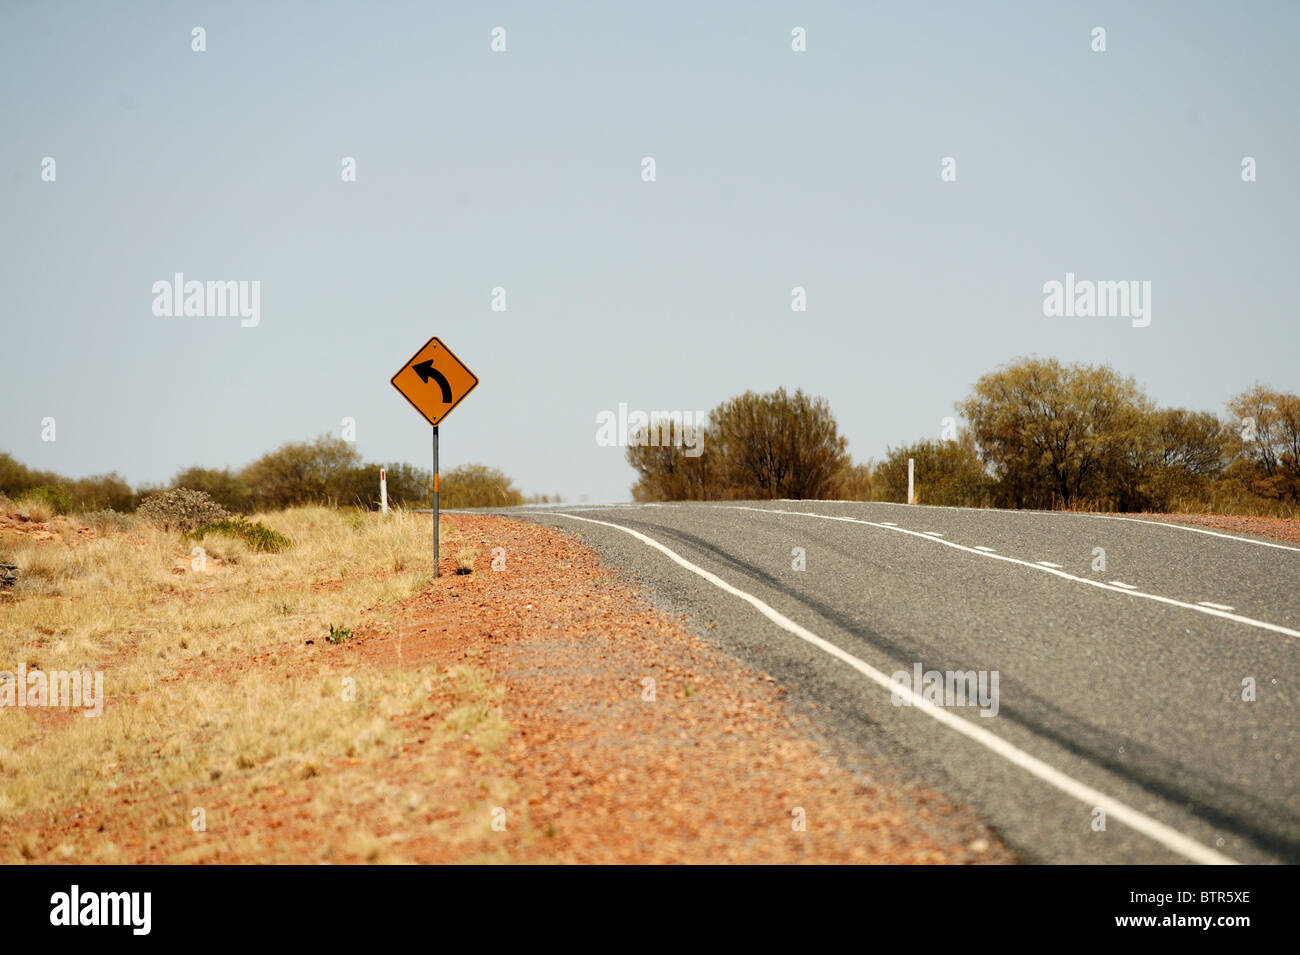 Australia, Curve road sign - Stock Image